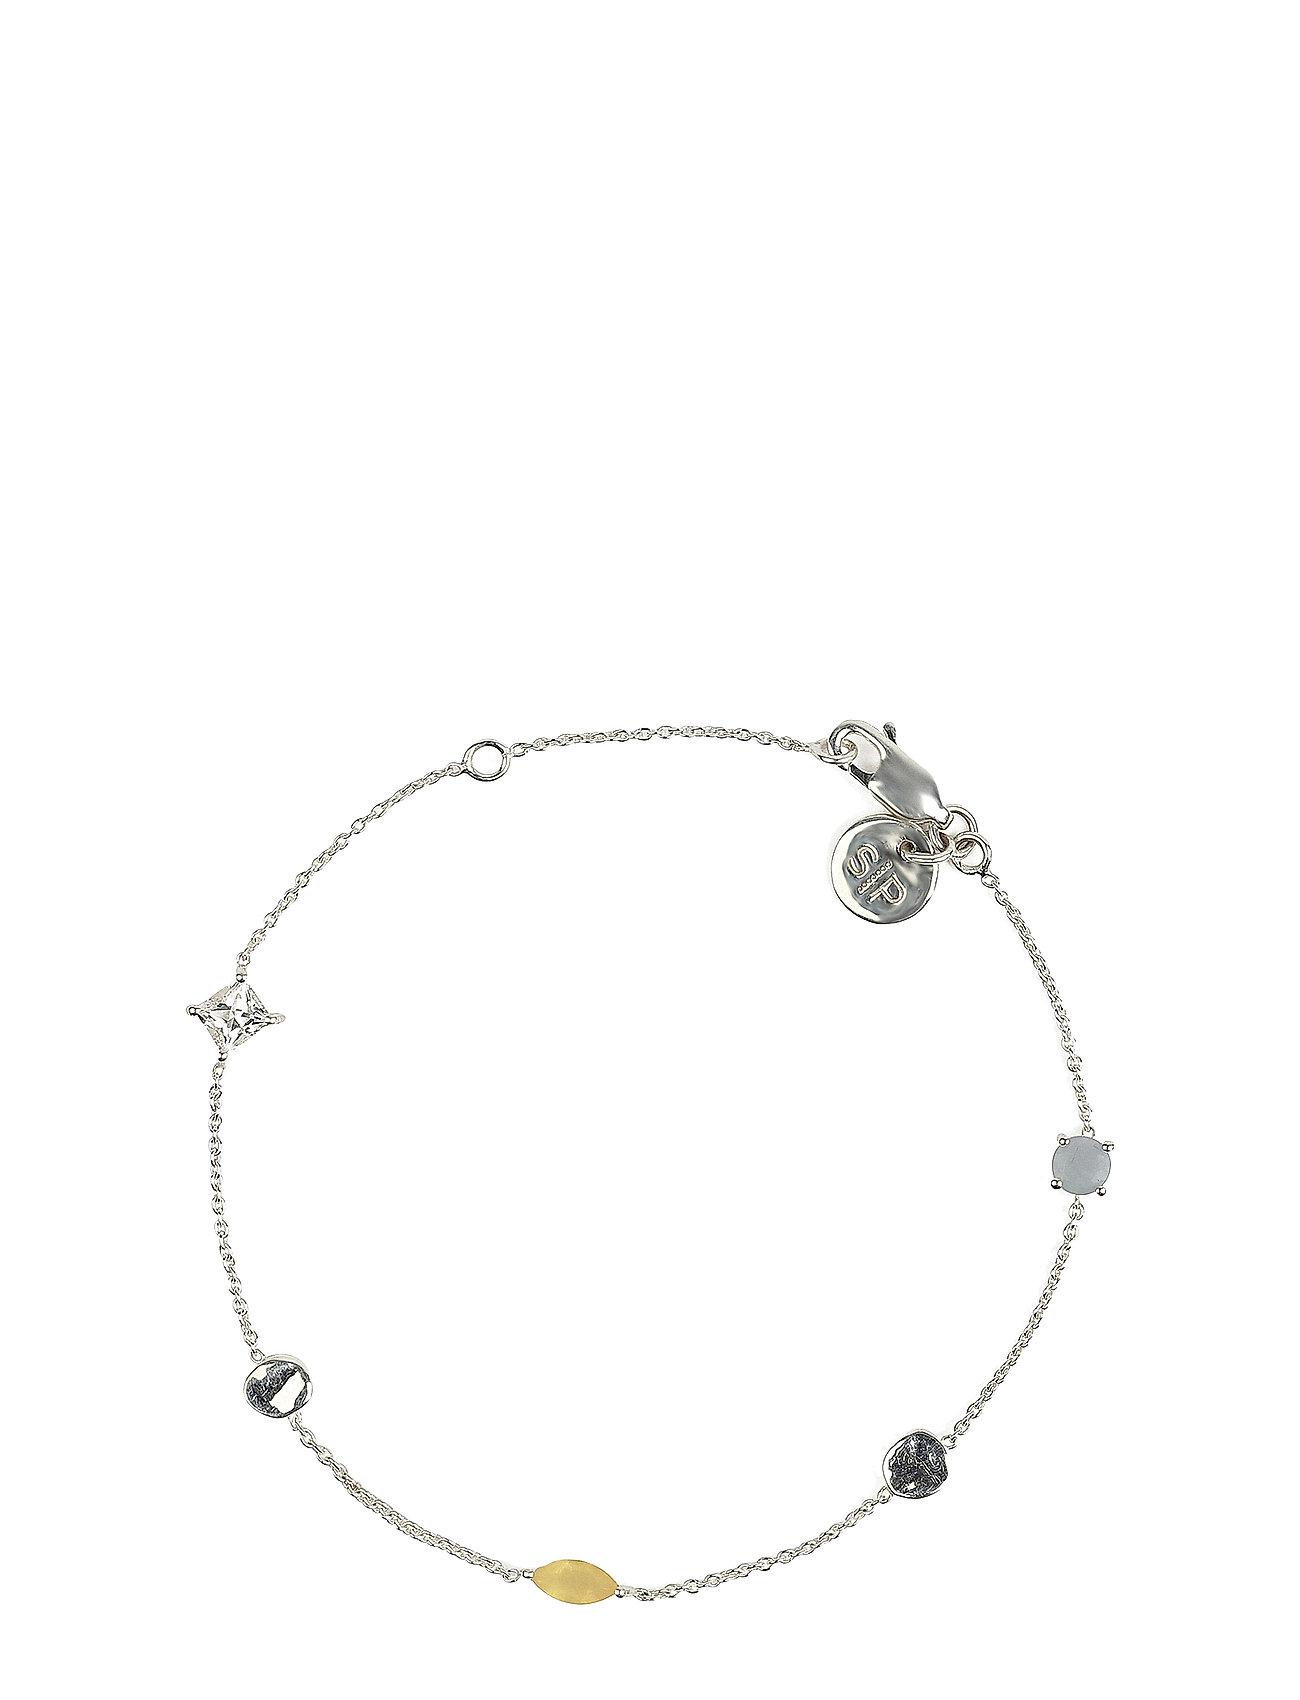 Divine Multi Bracelet Silver Accessories Jewellery Bracelets Chain Bracelets Sølv Syster P